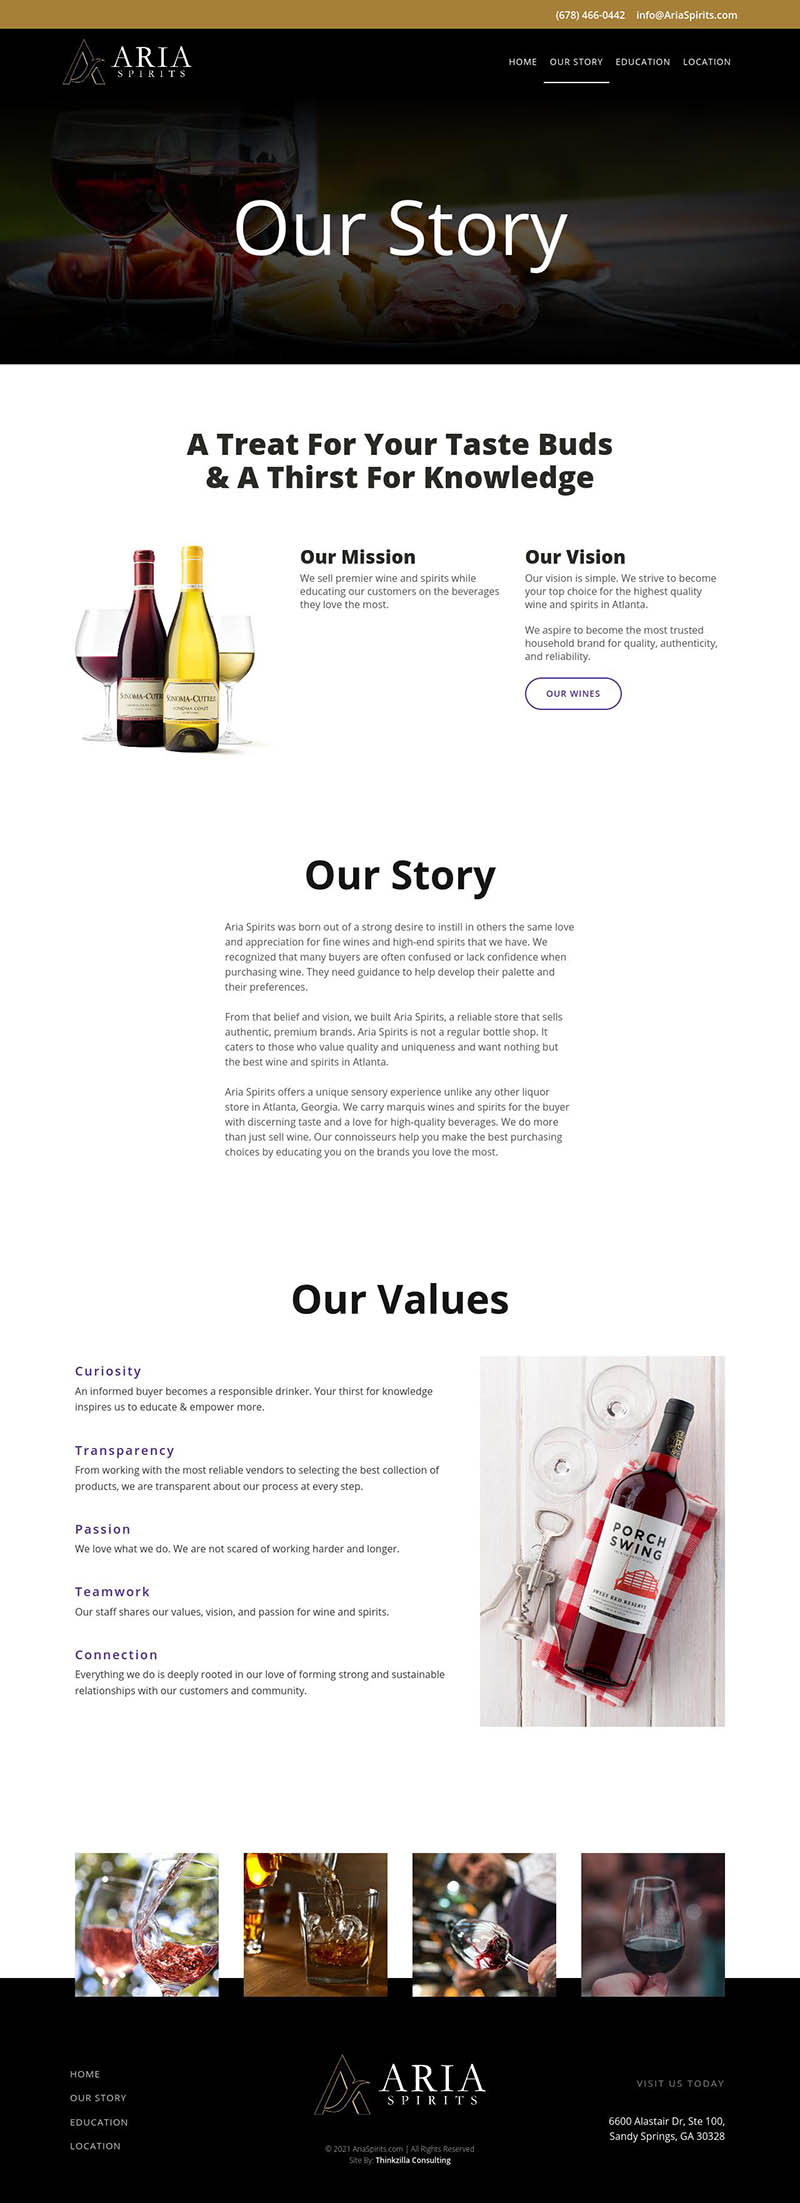 Aria Spirits - Our Story